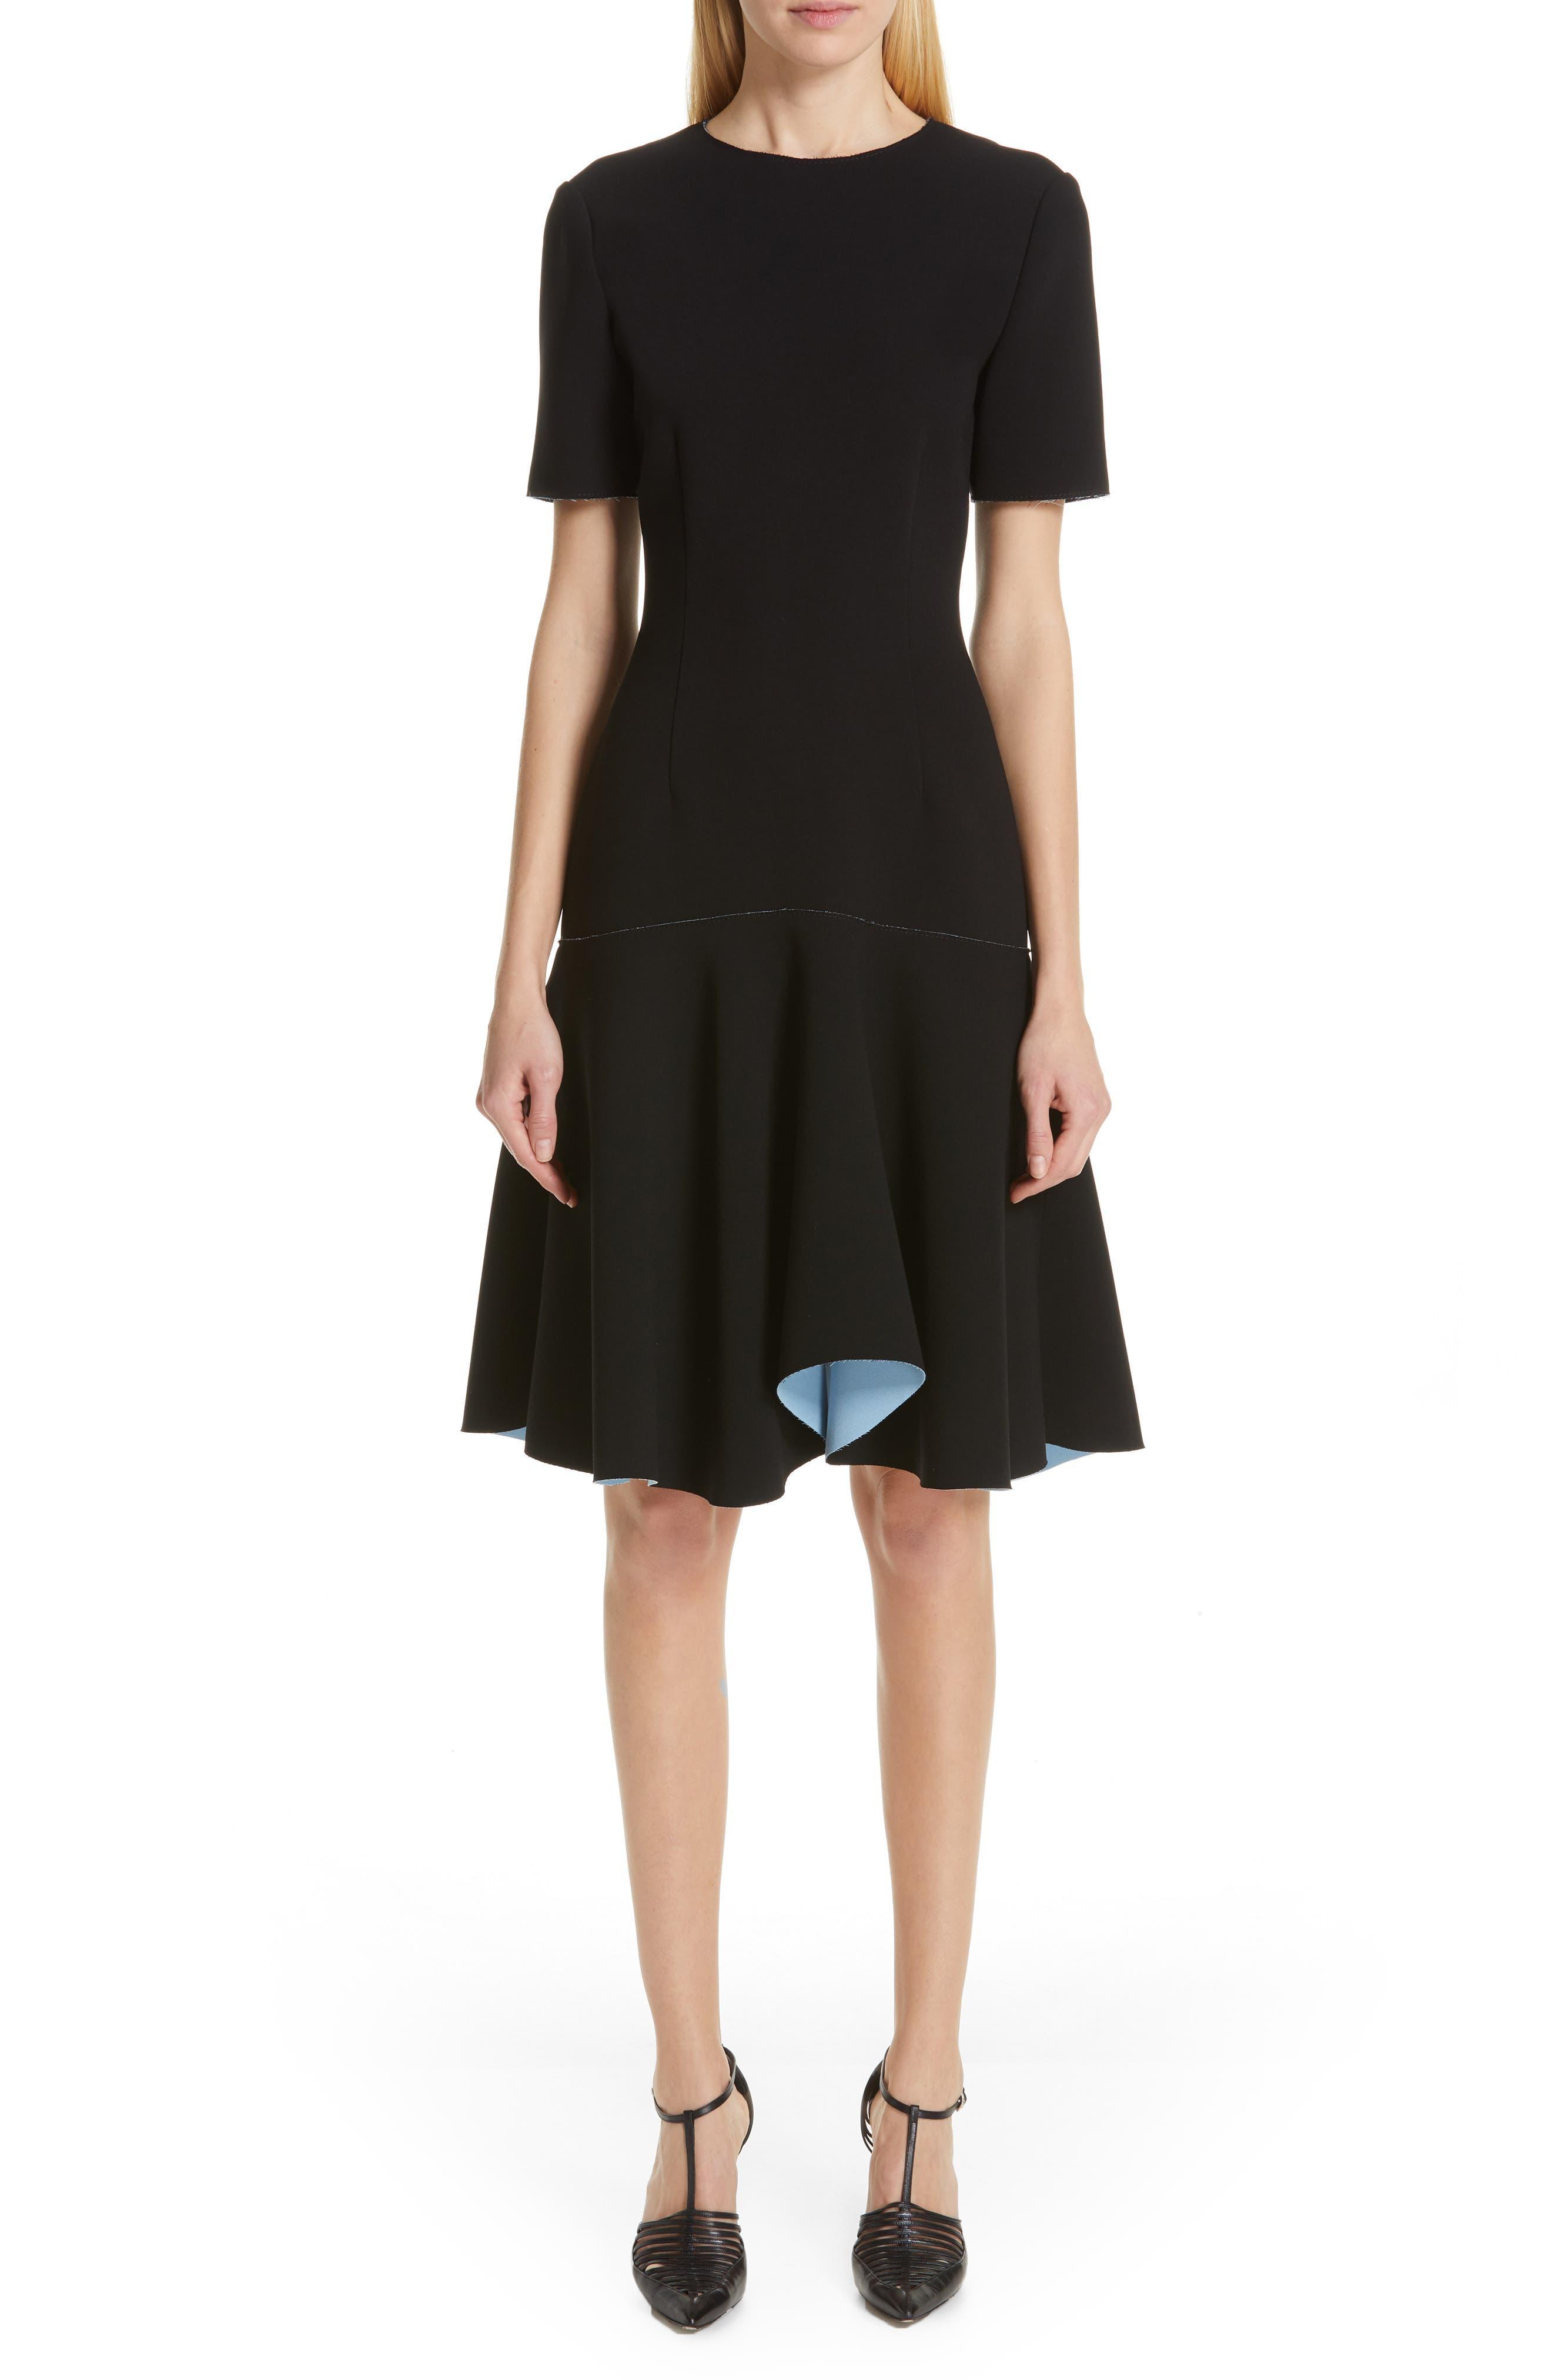 Jason Wu Collection Compact Crepe Flounce Dress, Black